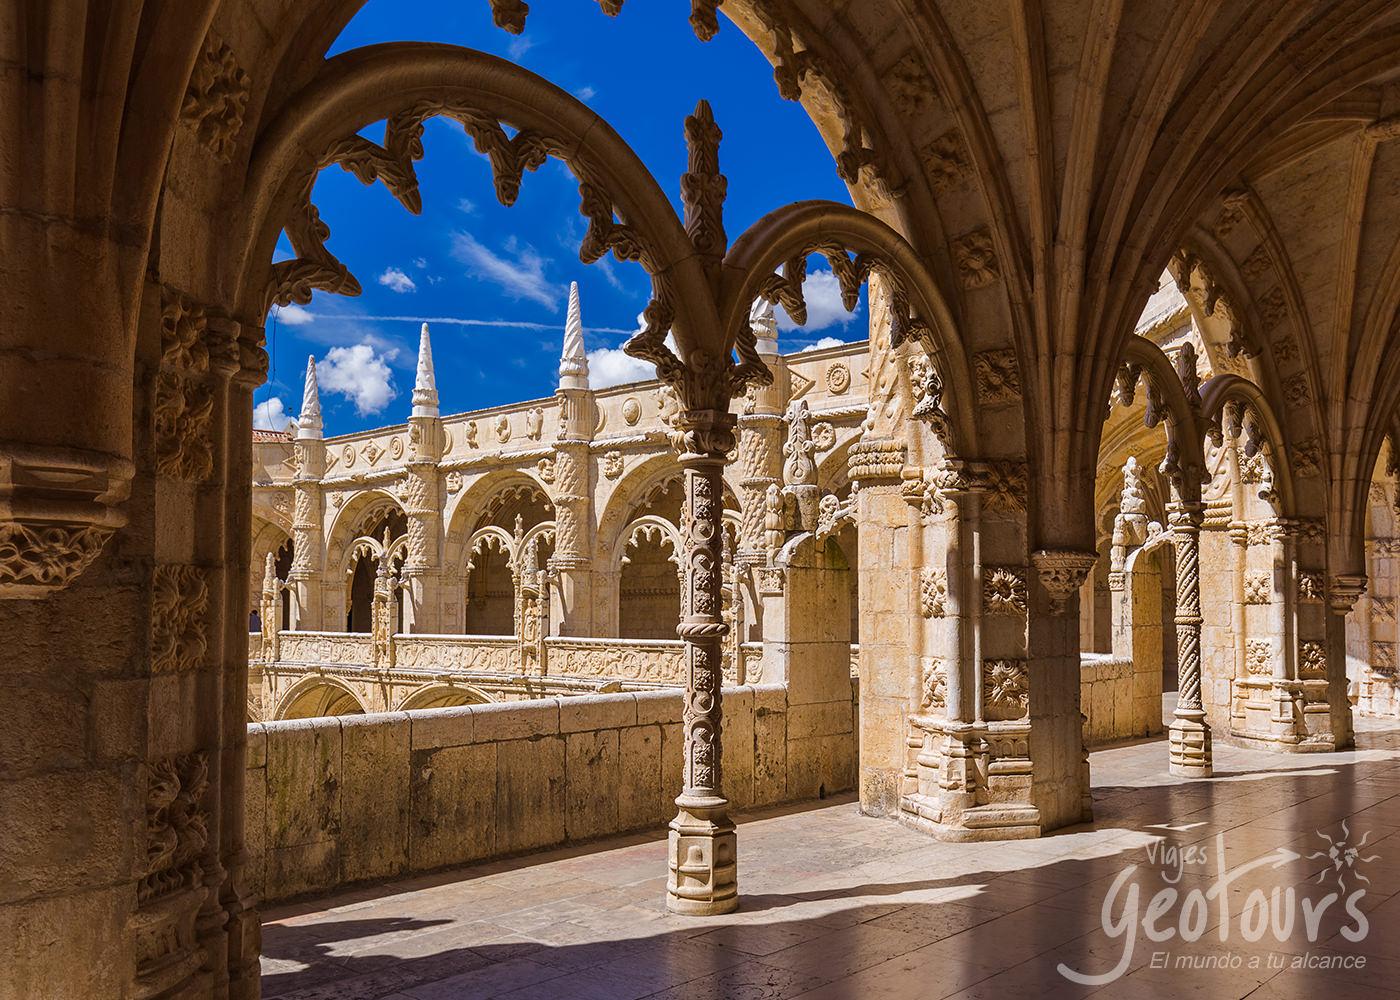 Santuarios Marianos (17 días y 5 Países) Inicio Lisboa - Fin Roma